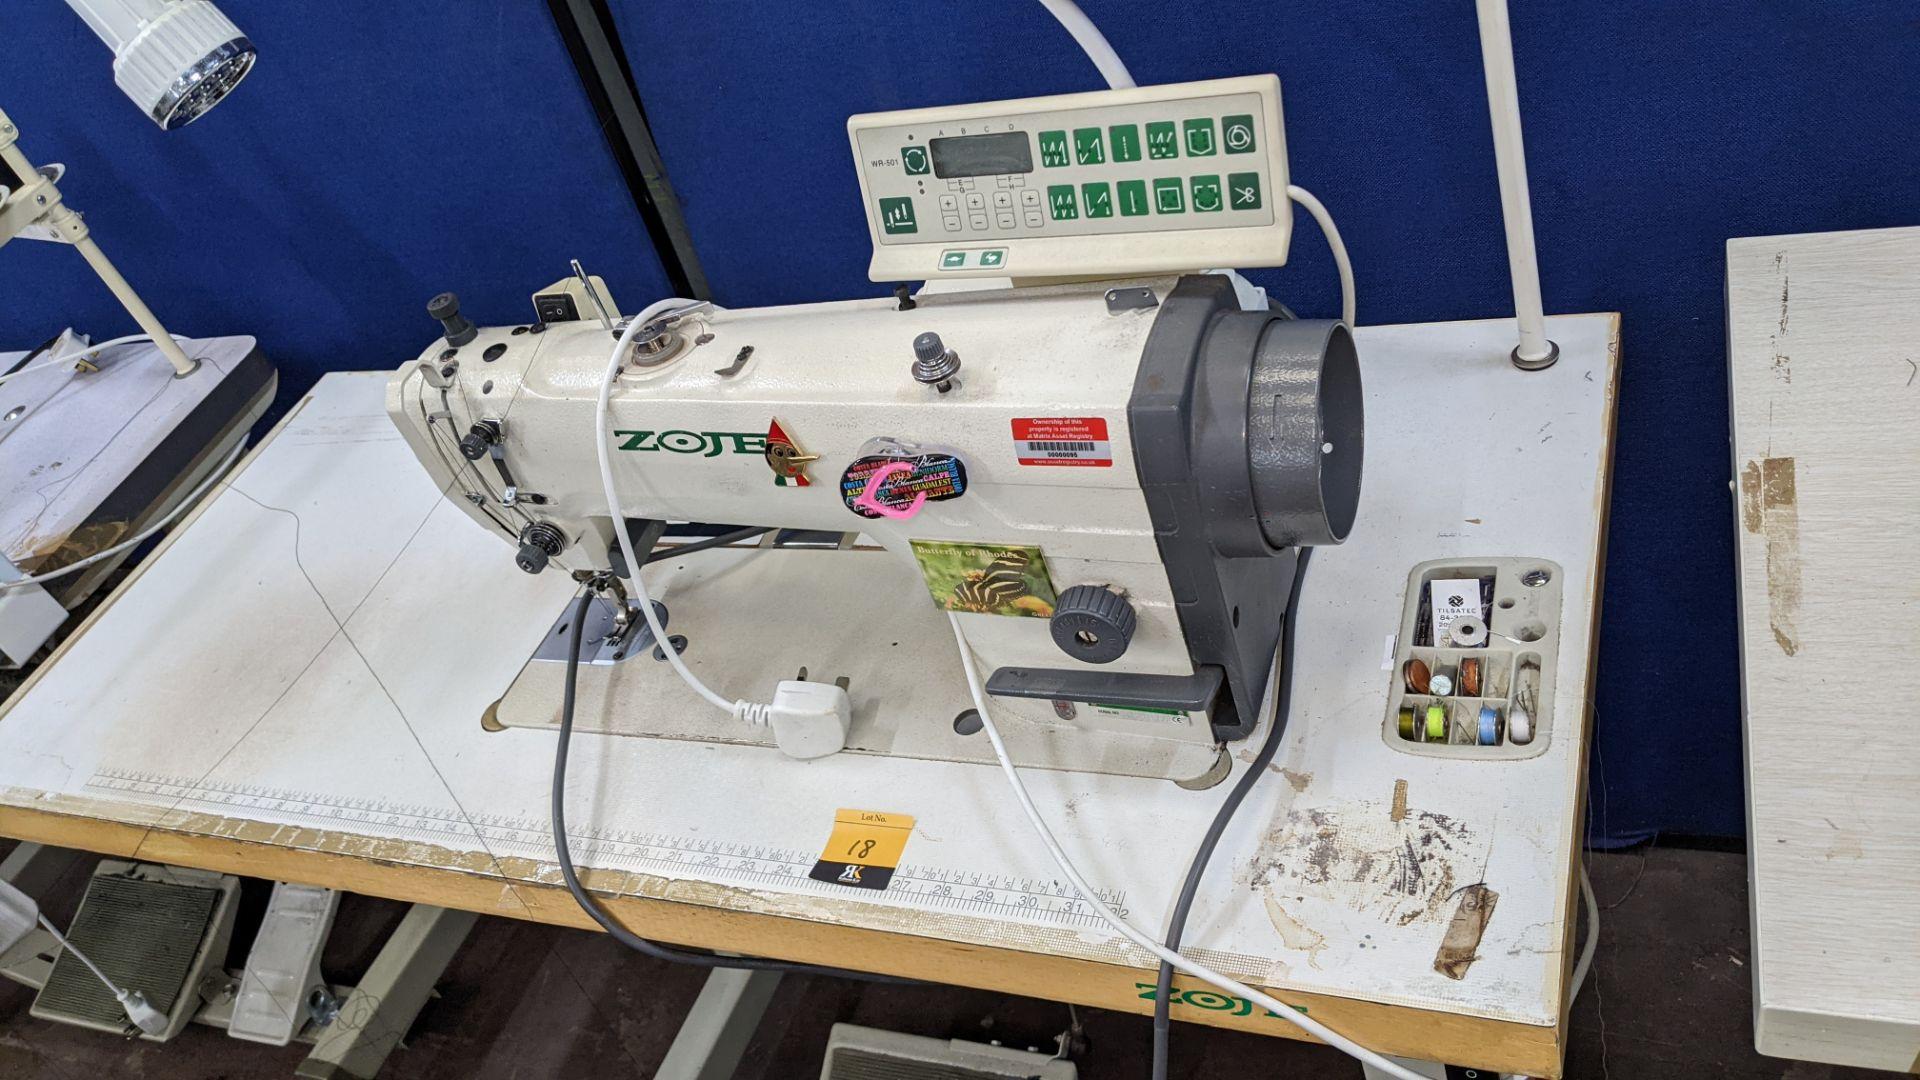 Zoje model ZJ9800A-D3B/PF lockstitch sewing machine with model WR-501 digital controller - Image 16 of 20